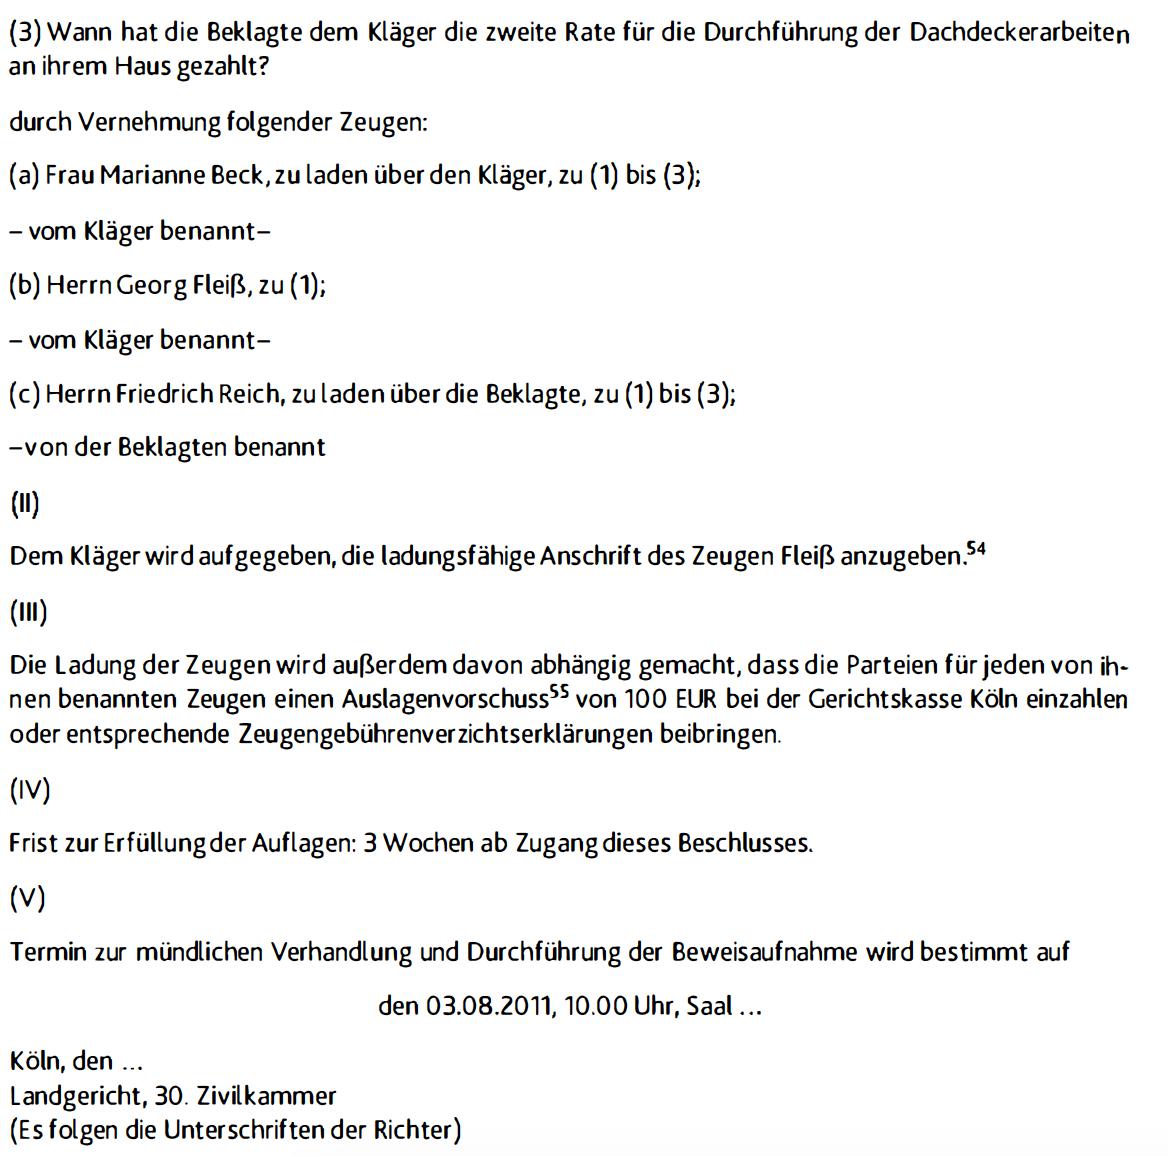 Anlage 08 Beweisbeschluss Gutachter Polster 6